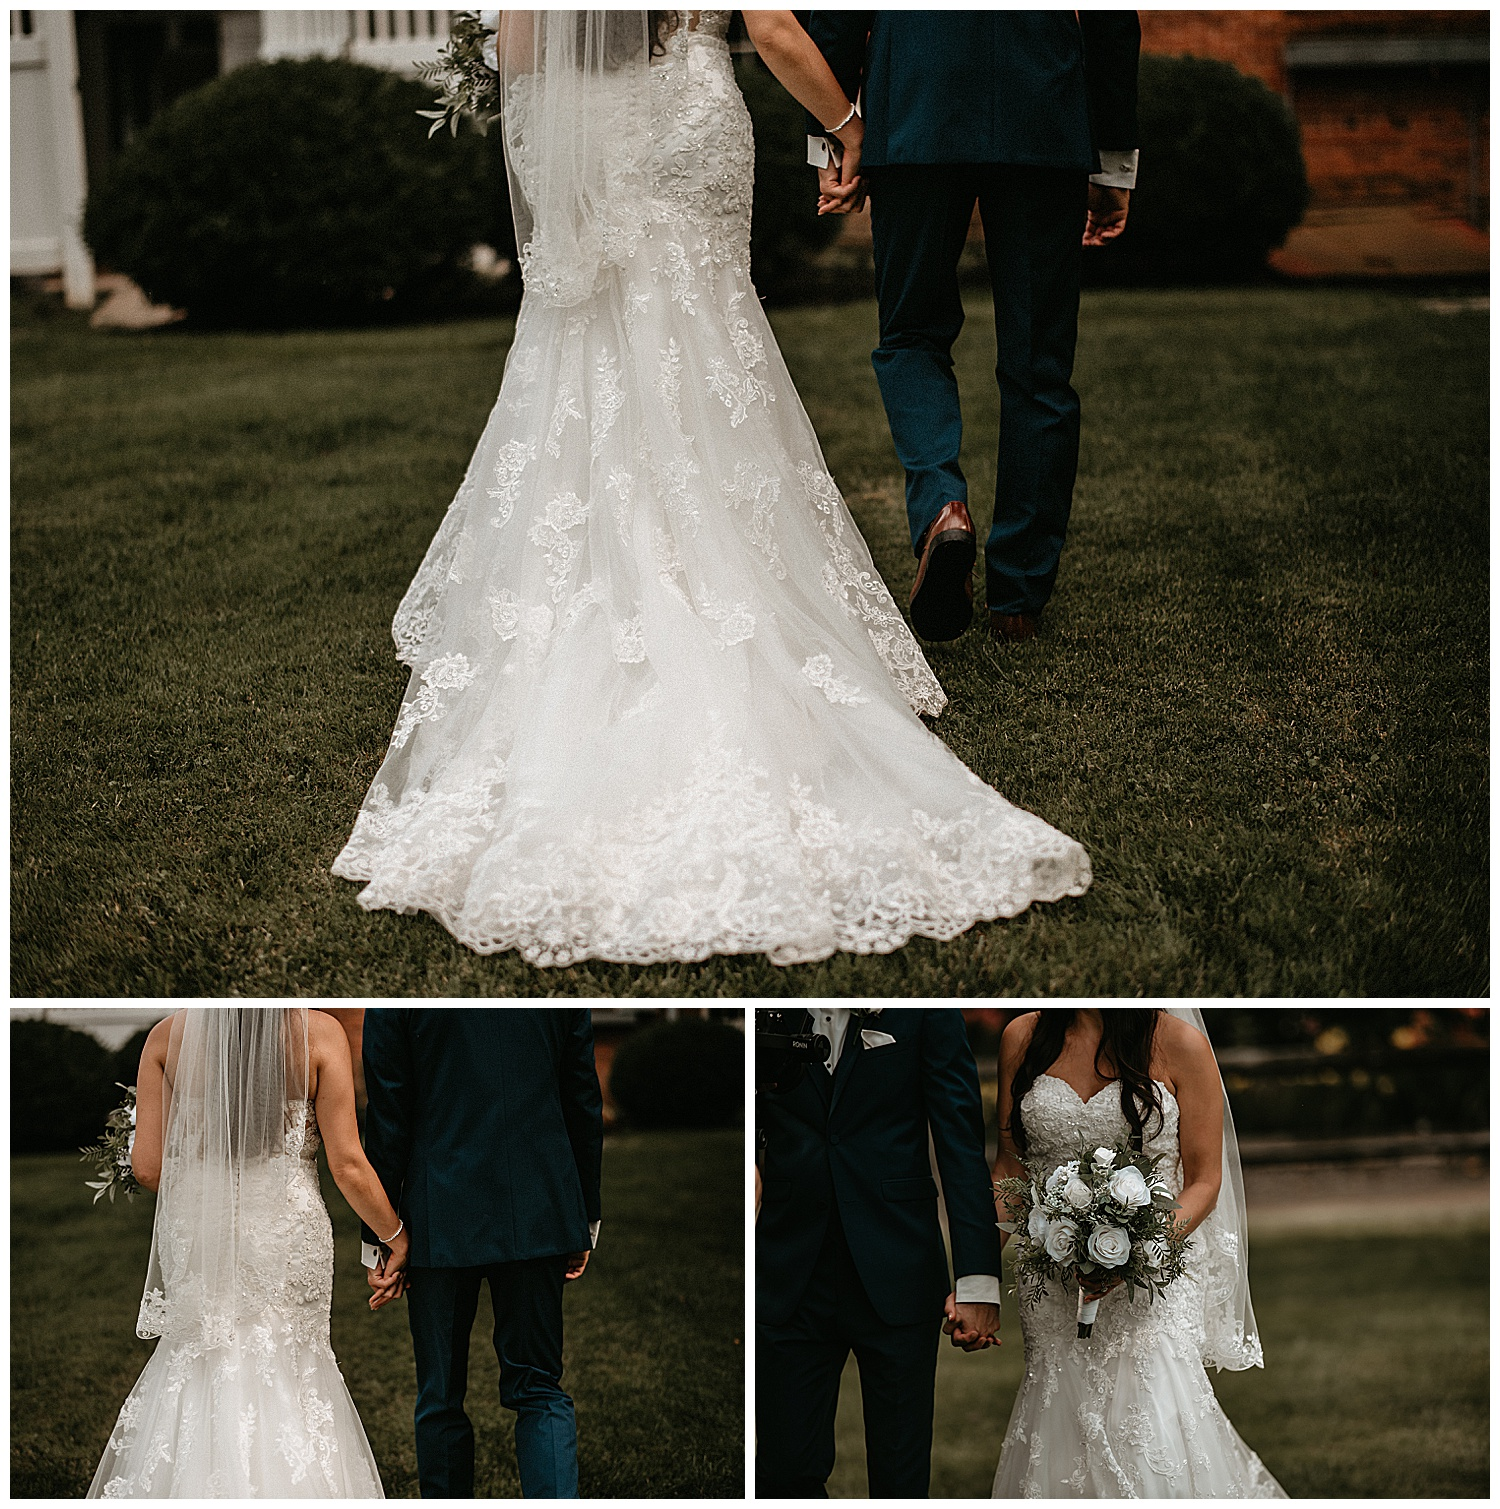 NEPA-Bloomsburg-Wedding-Photographer-at-The-Barn-at-Boones-Dam-Bloomsburg-PA_0041.jpg